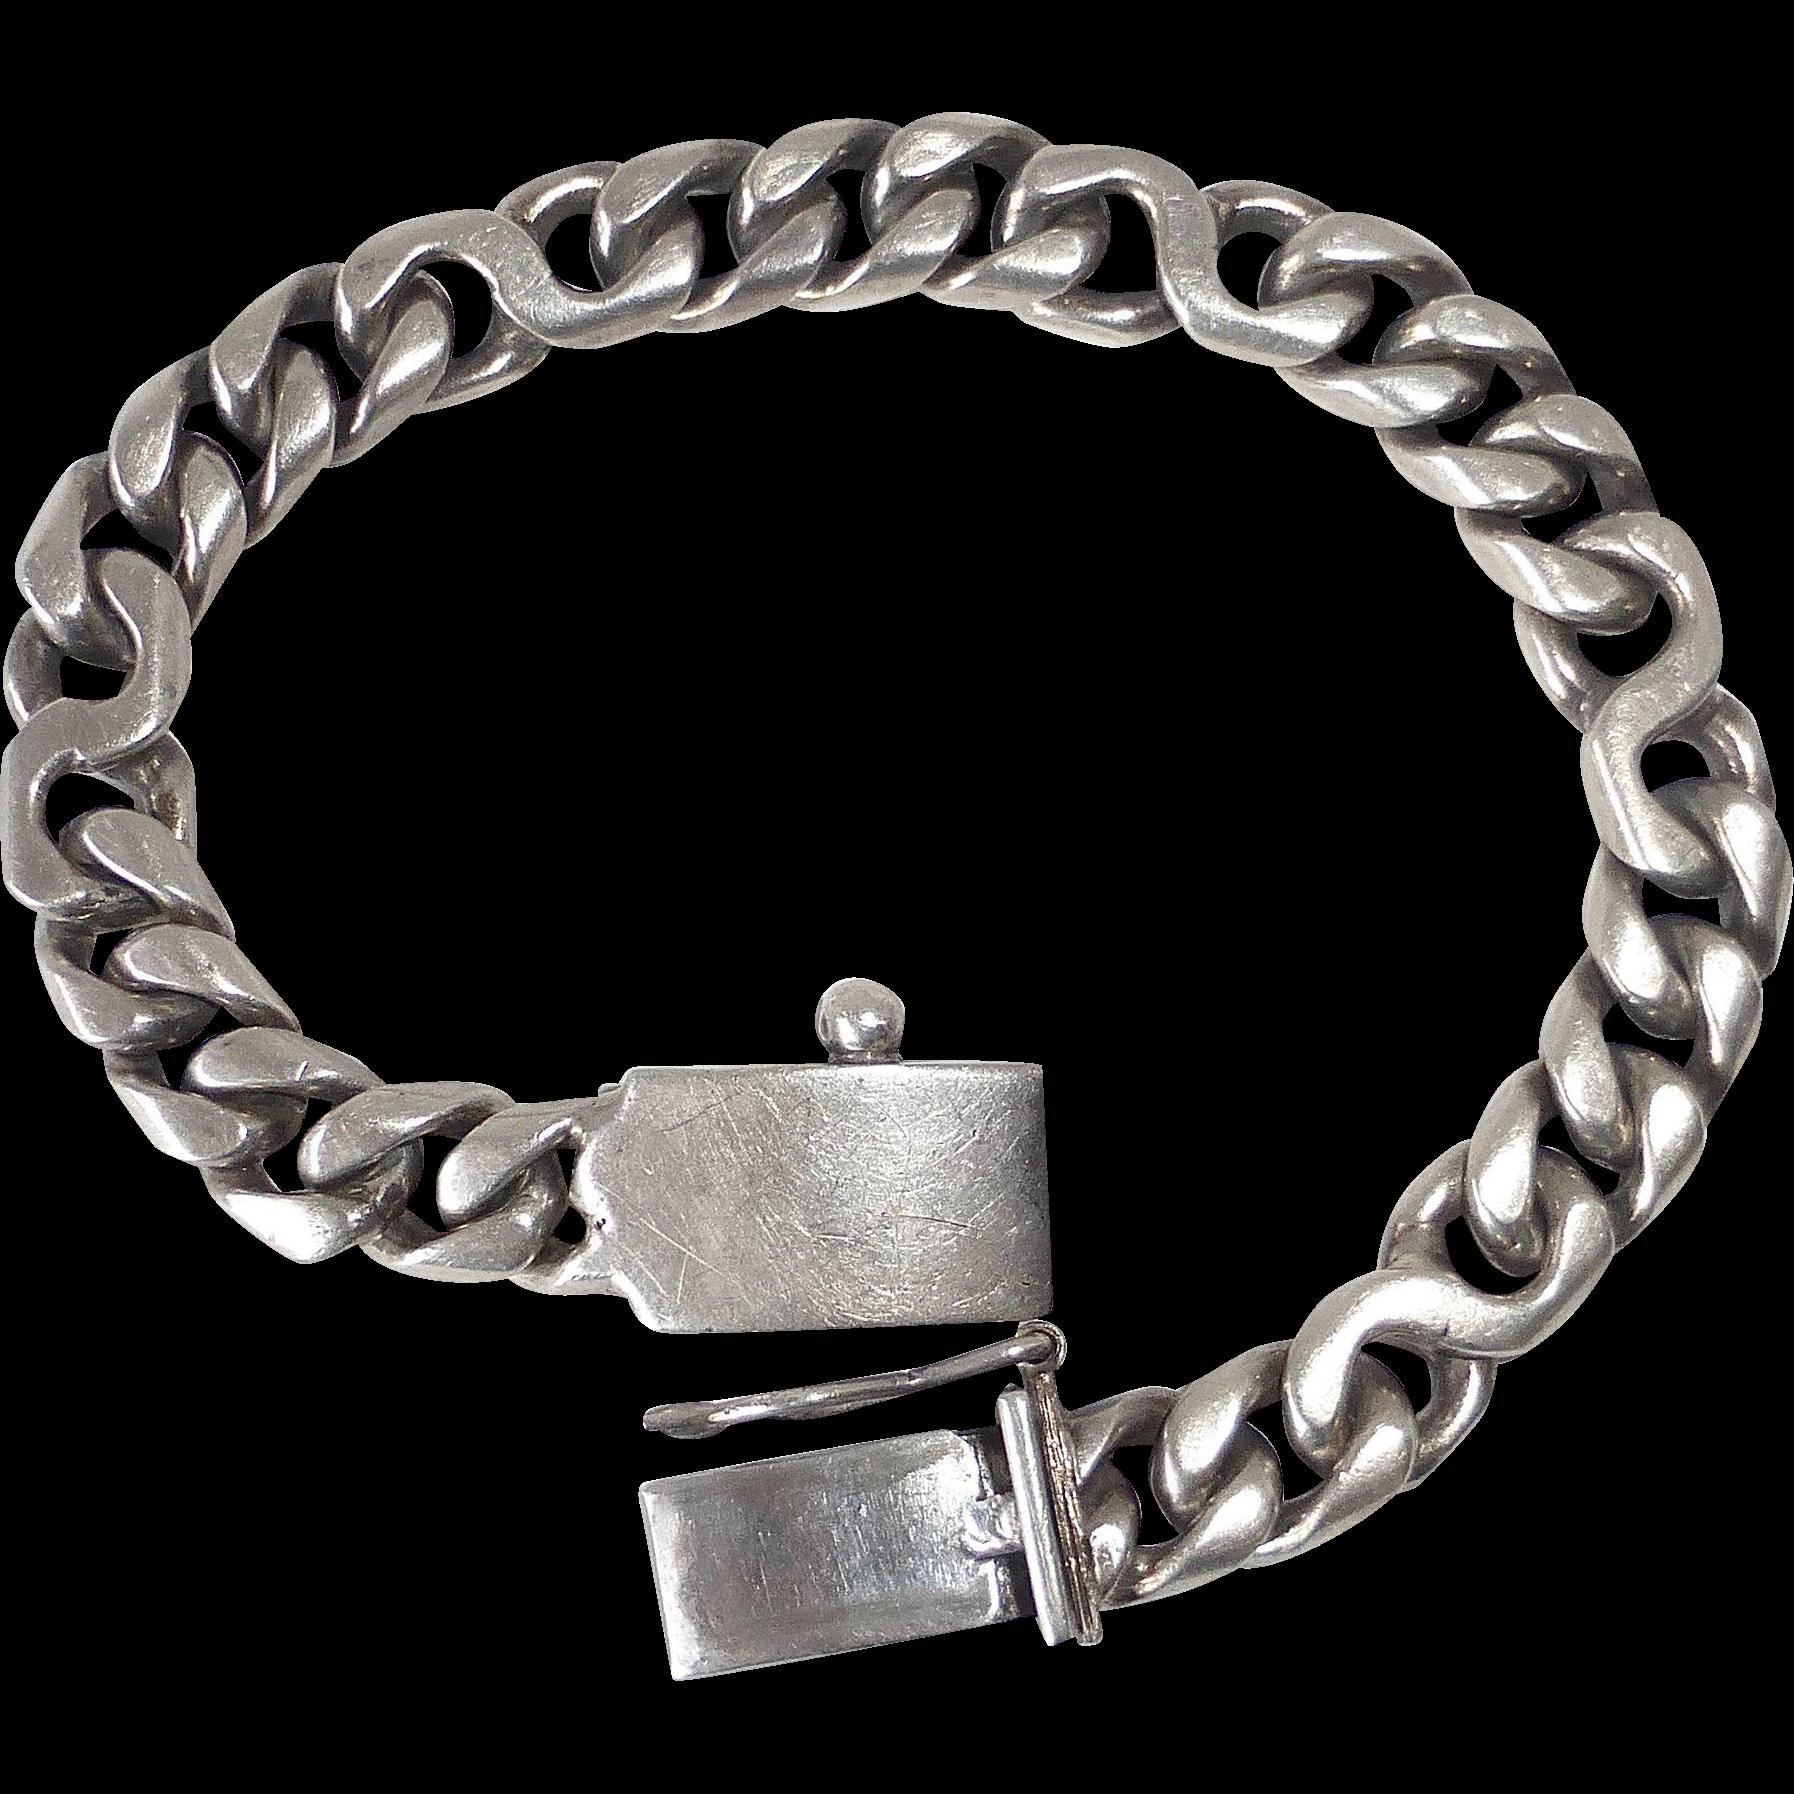 Mexican Sterling Heavy Flat Curb Chain Bracelet w Twist